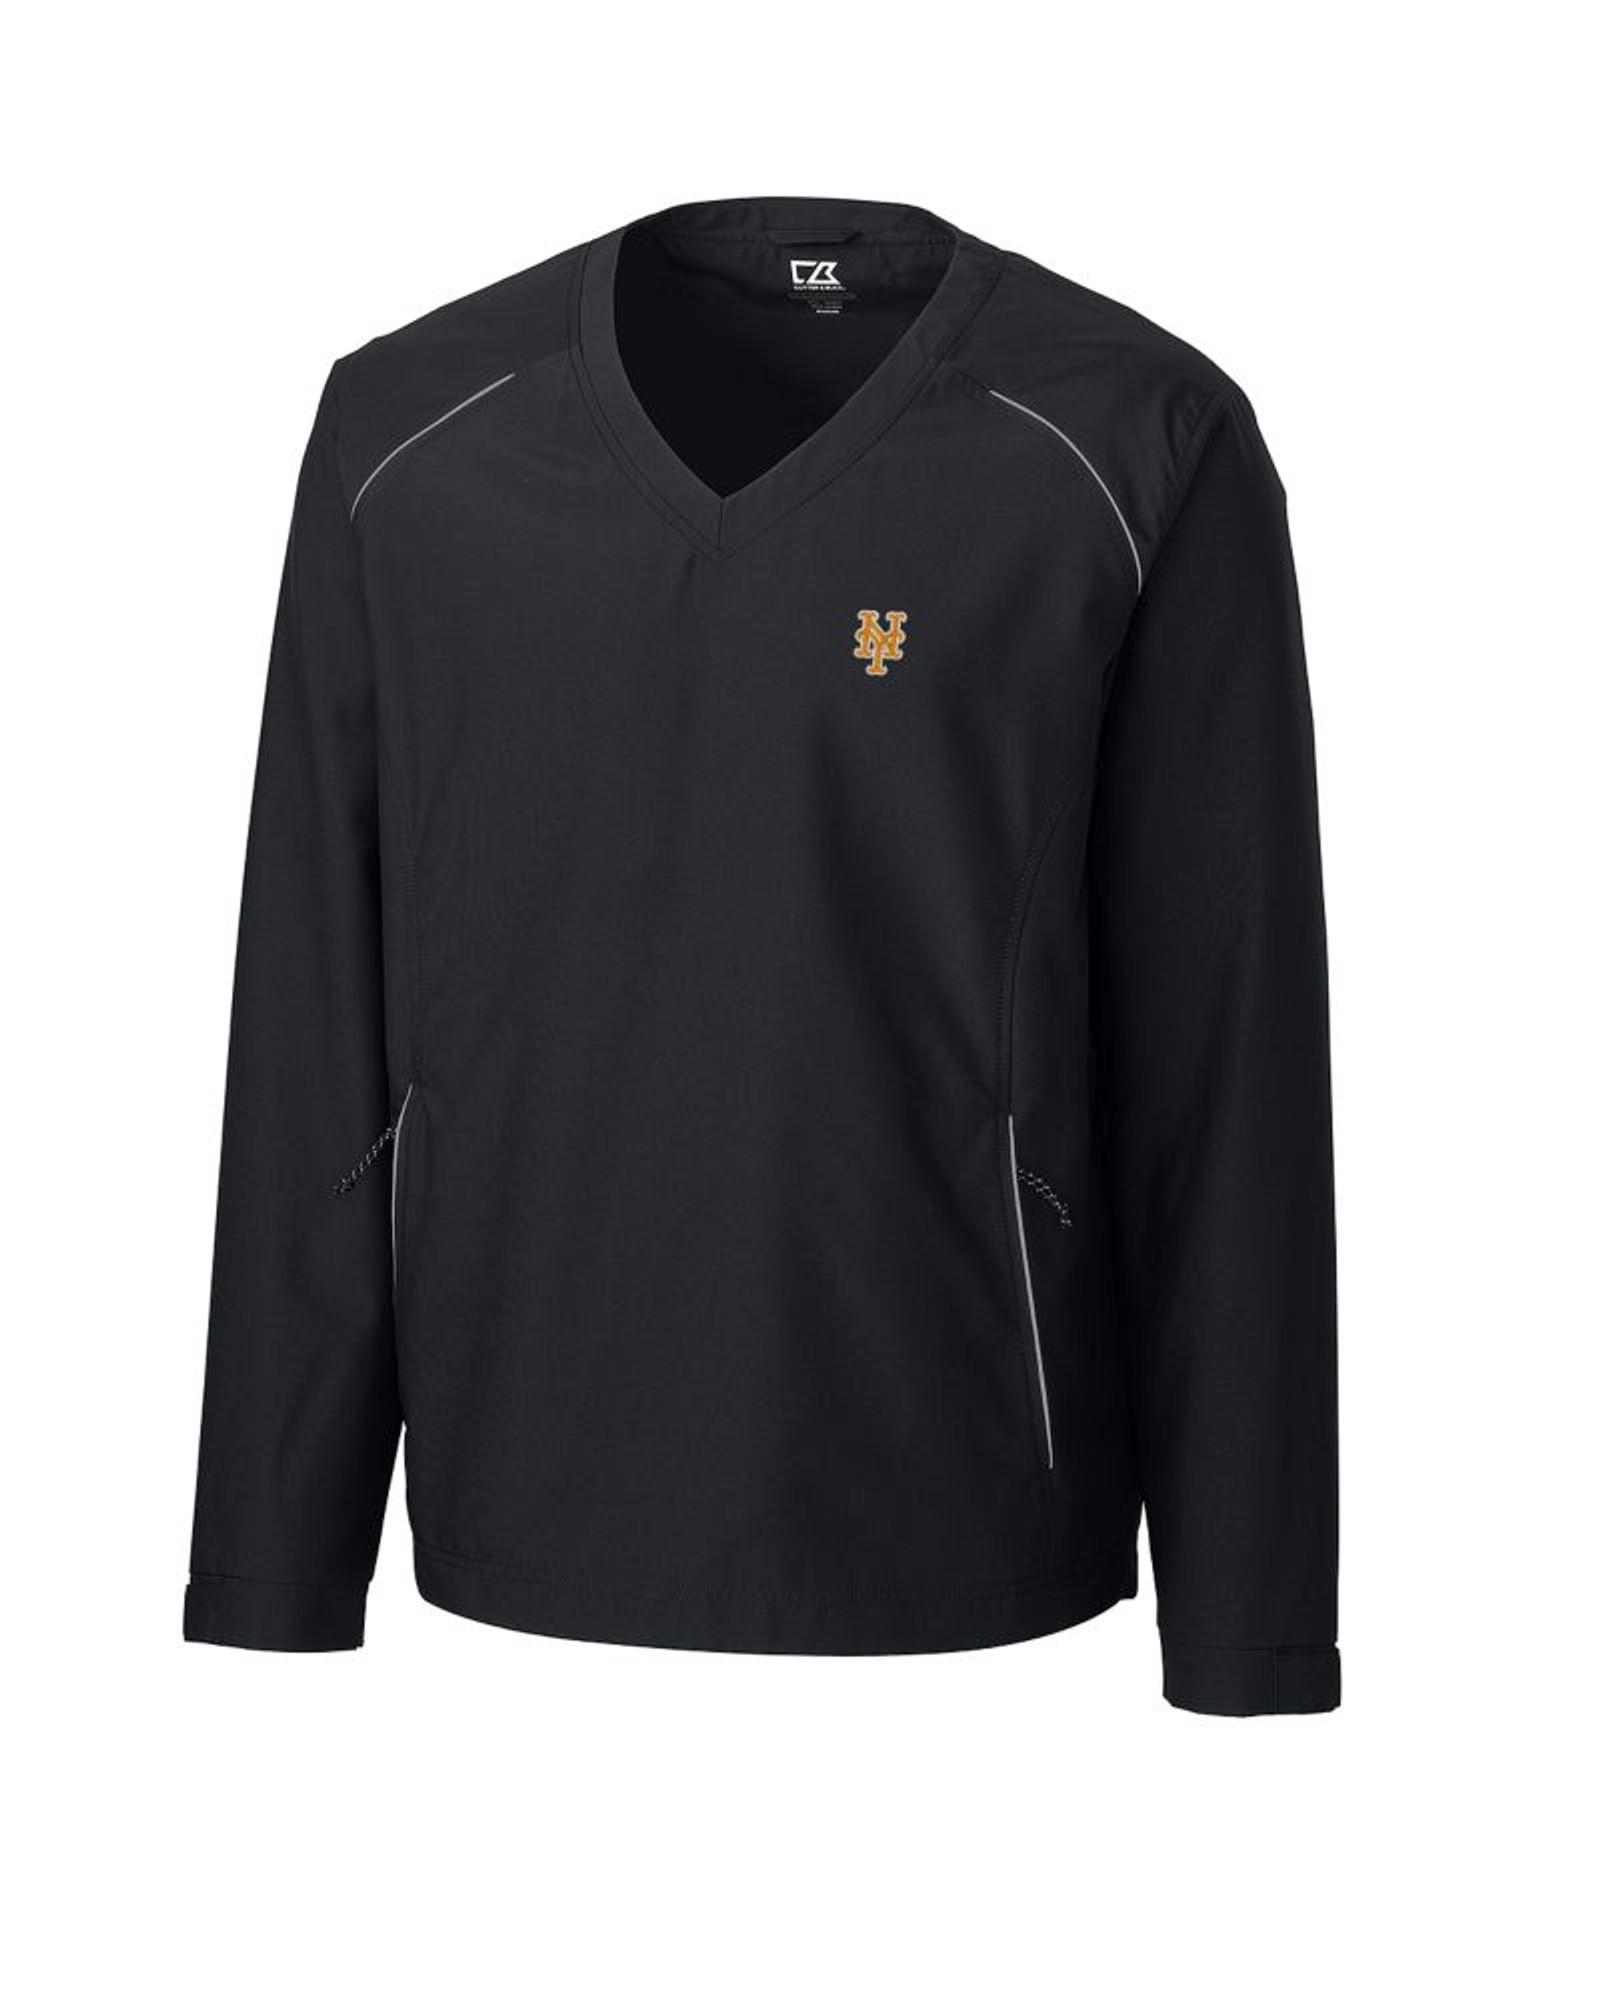 premium selection f1166 6c465 New York Mets CB WeatherTec Beacon V-neck Windshirt